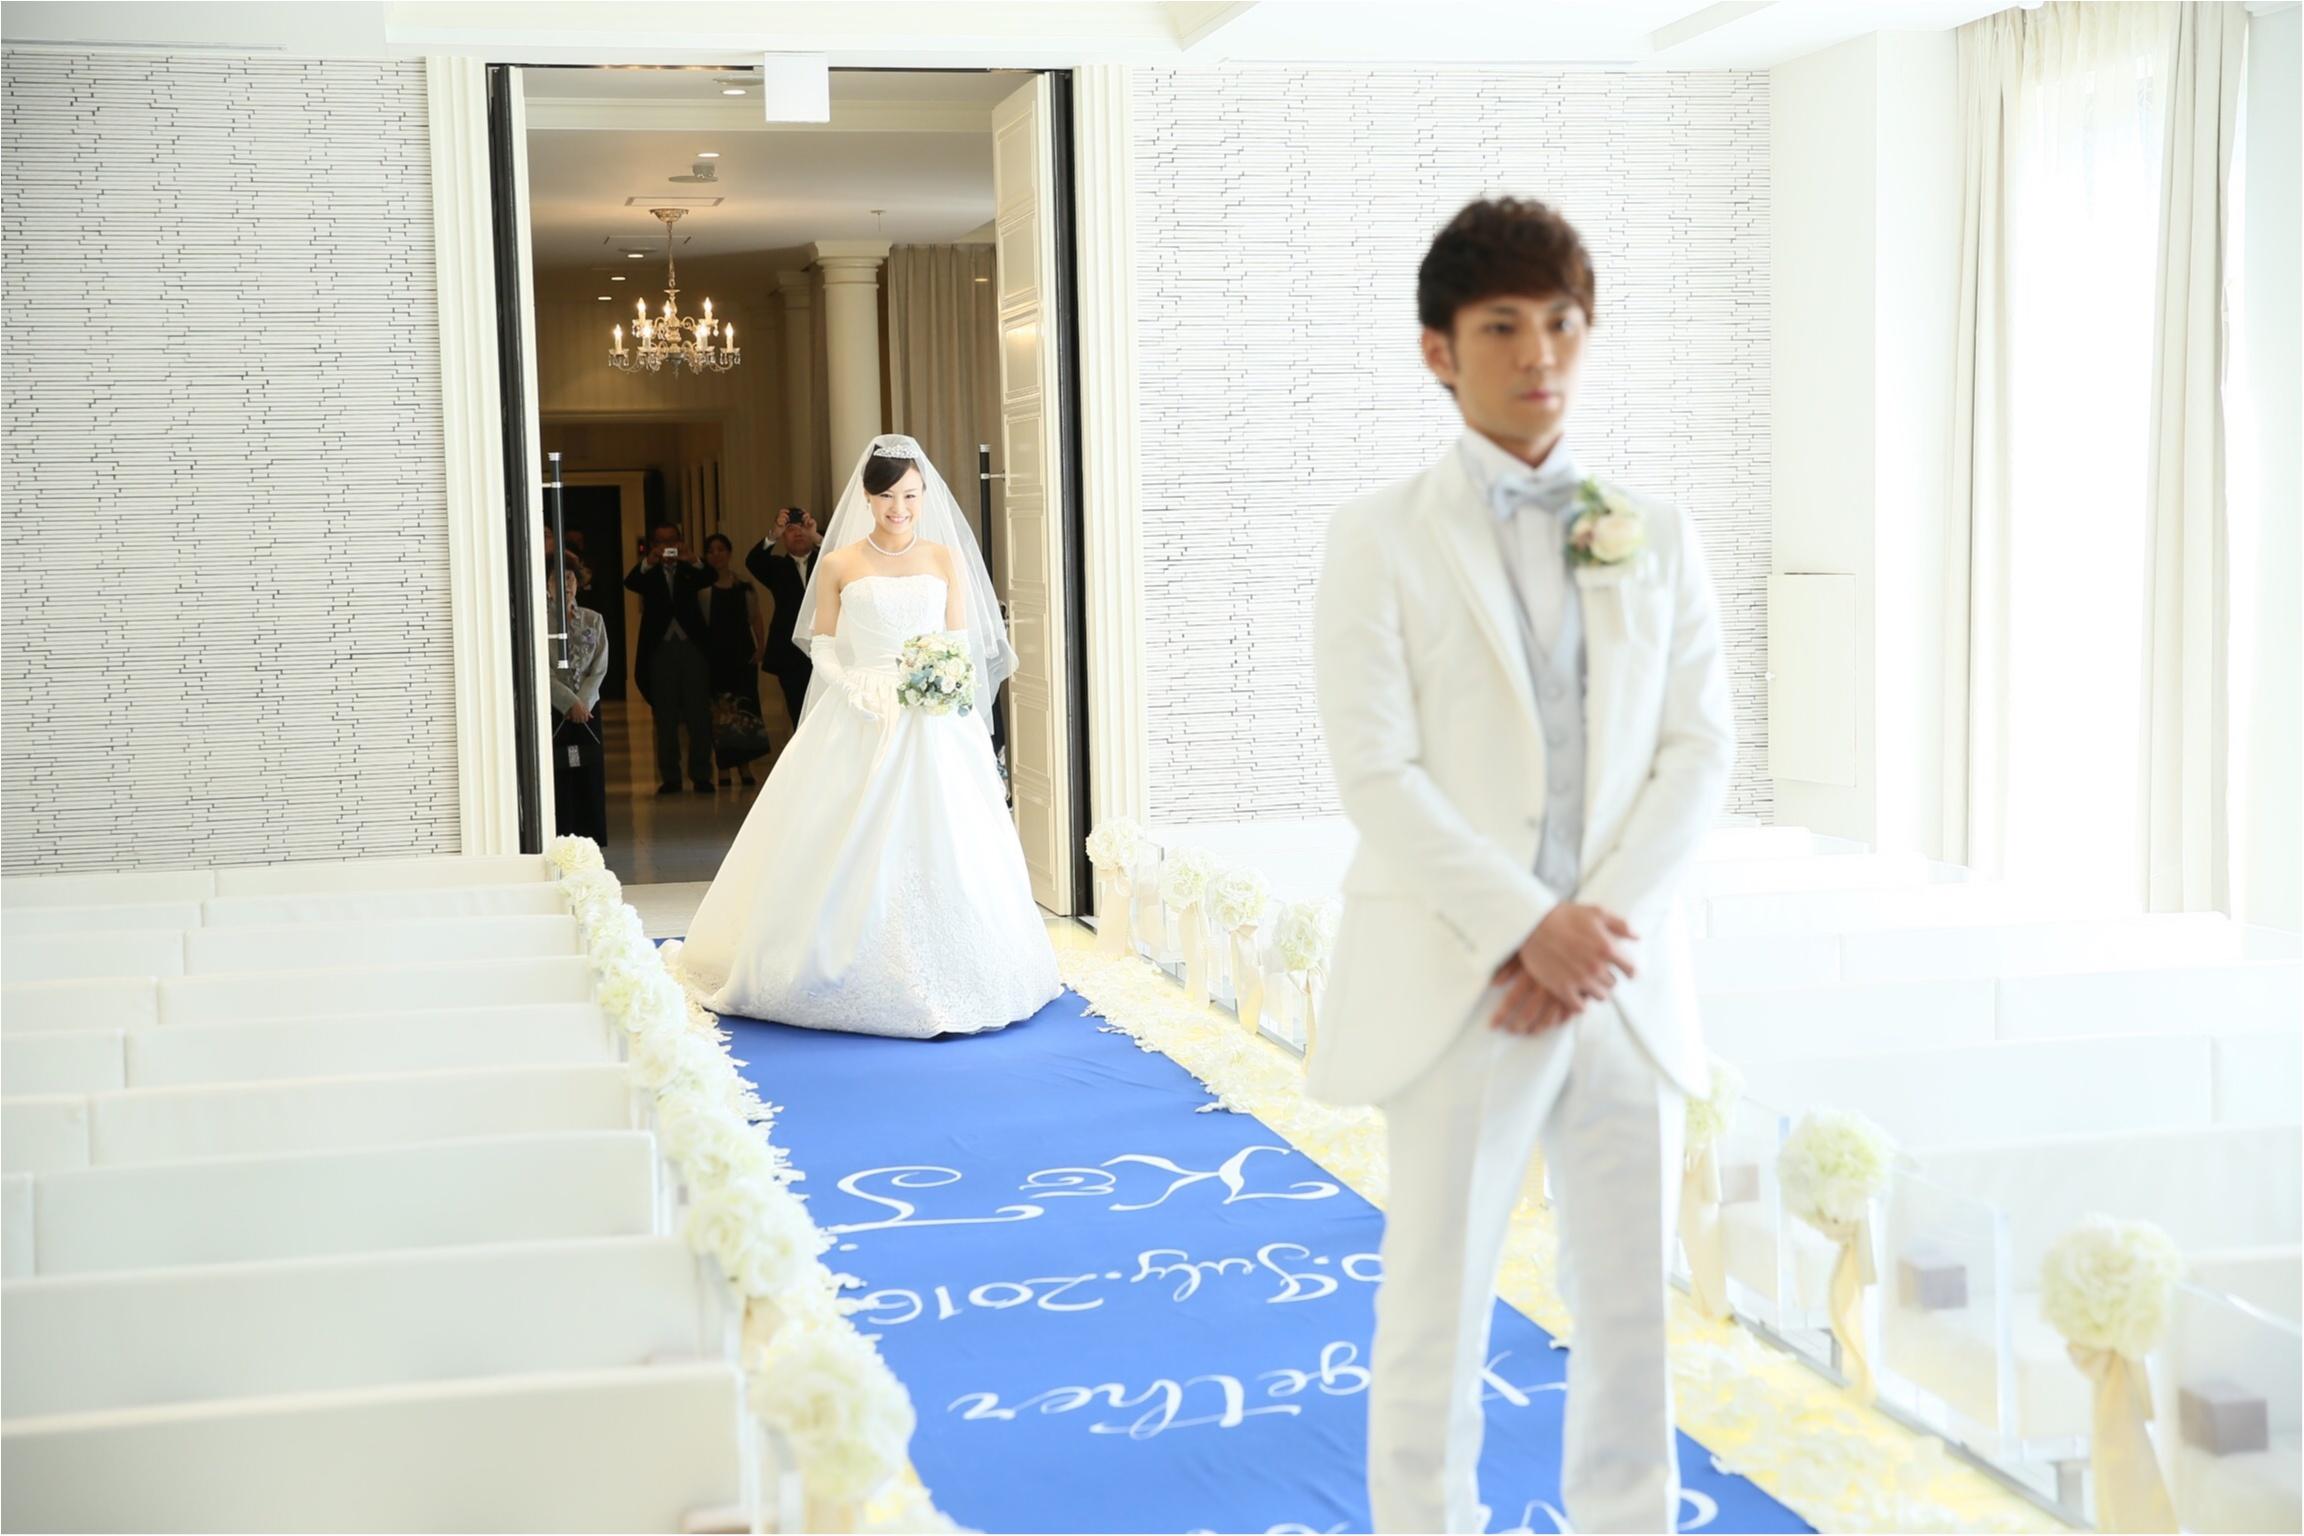 moco婚②▶︎まずは、ドキドキのファーストミート♡♡そこでなんと……_1